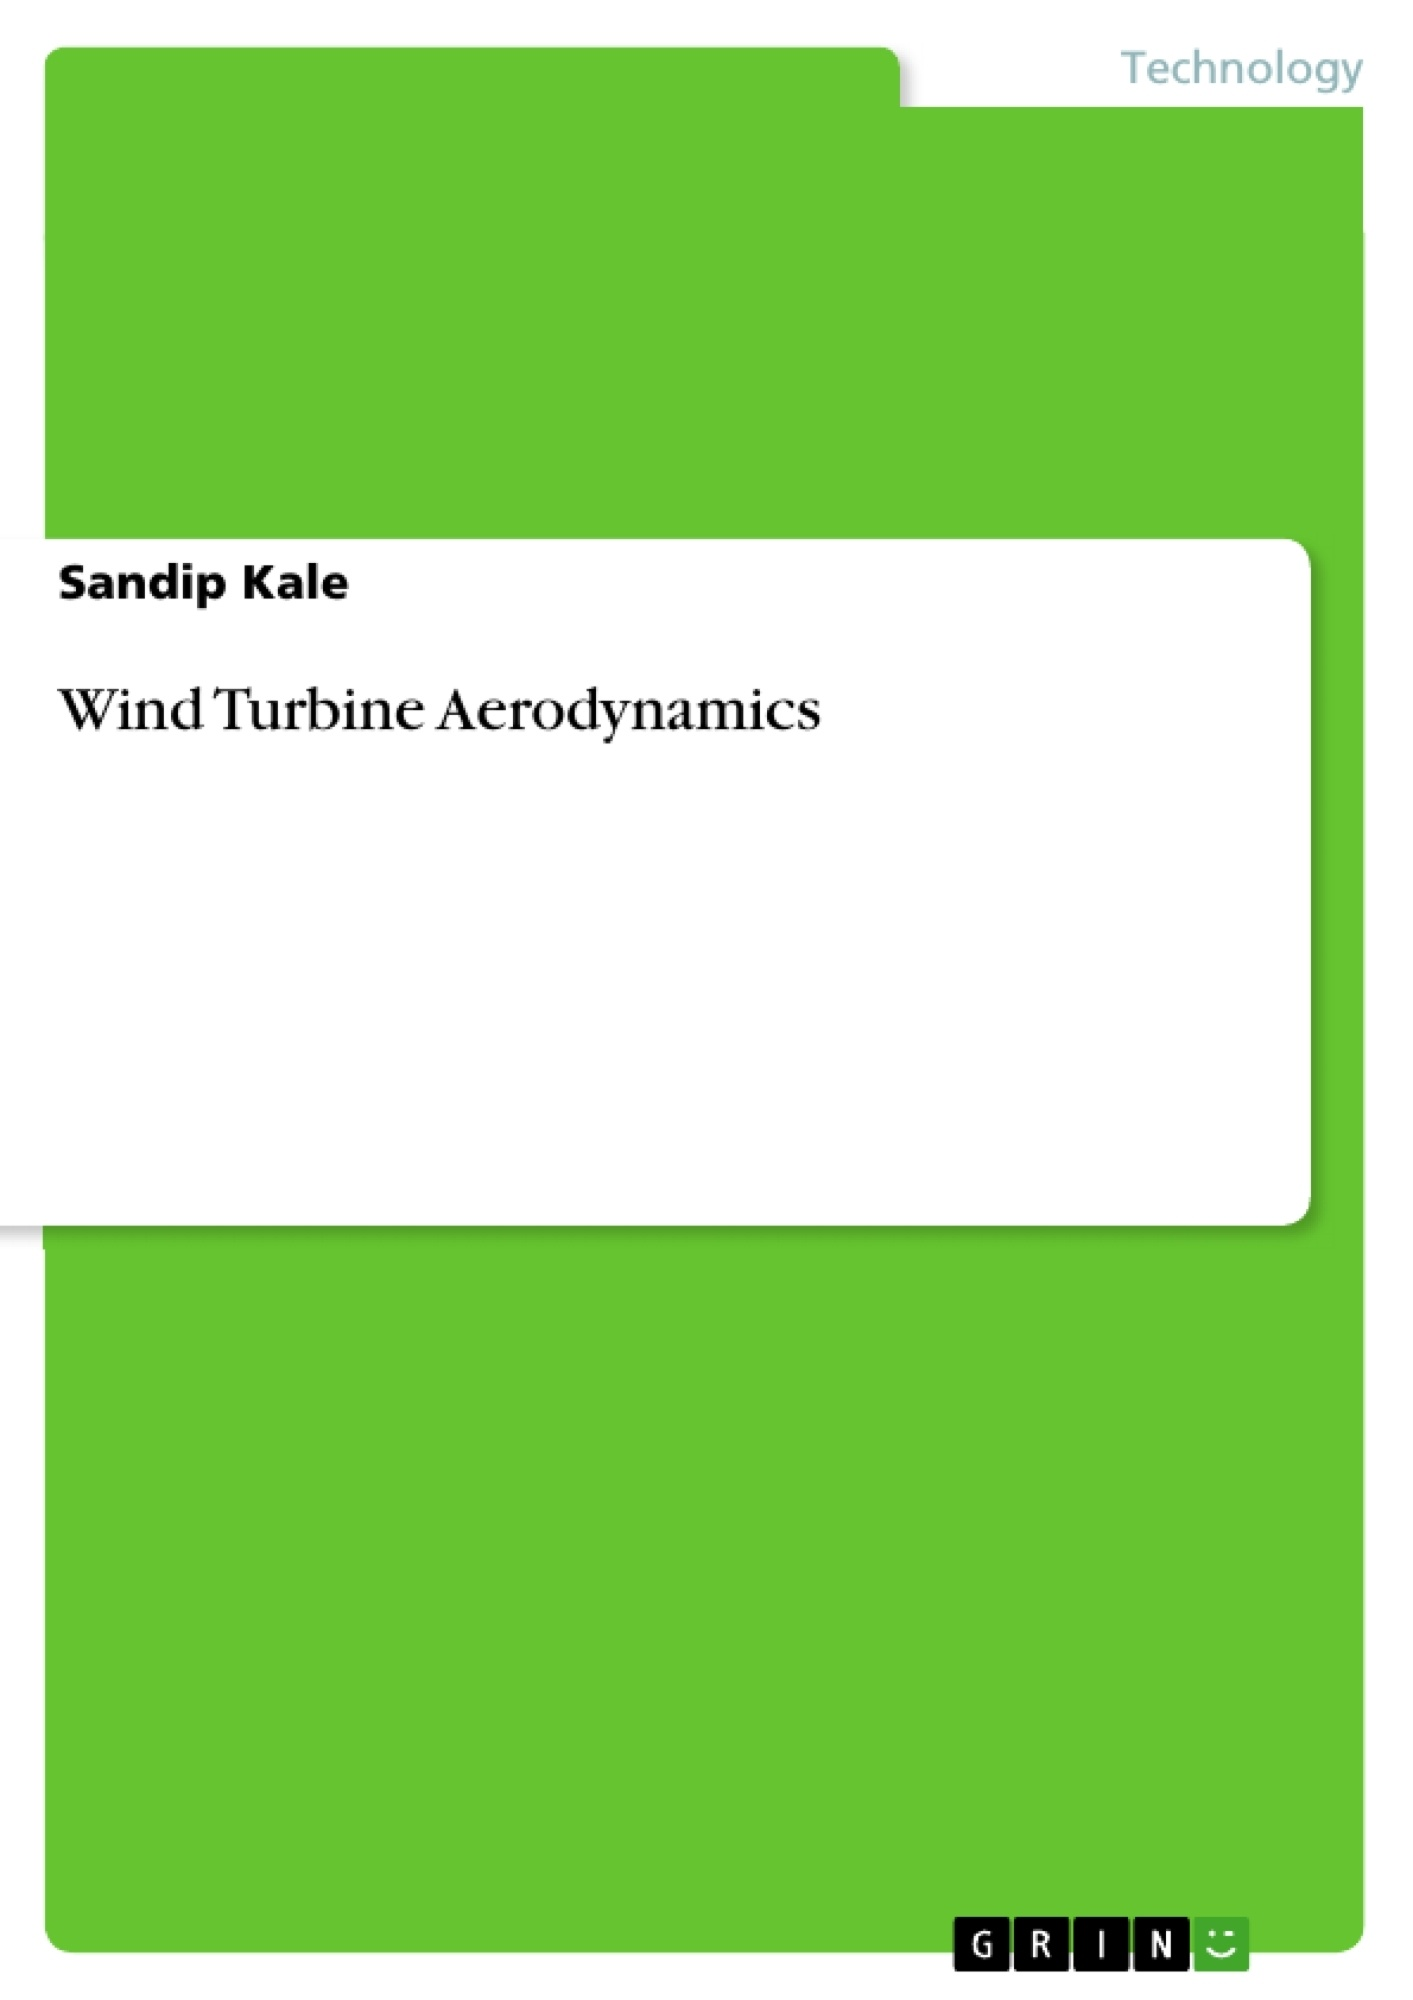 Title: Wind Turbine Aerodynamics